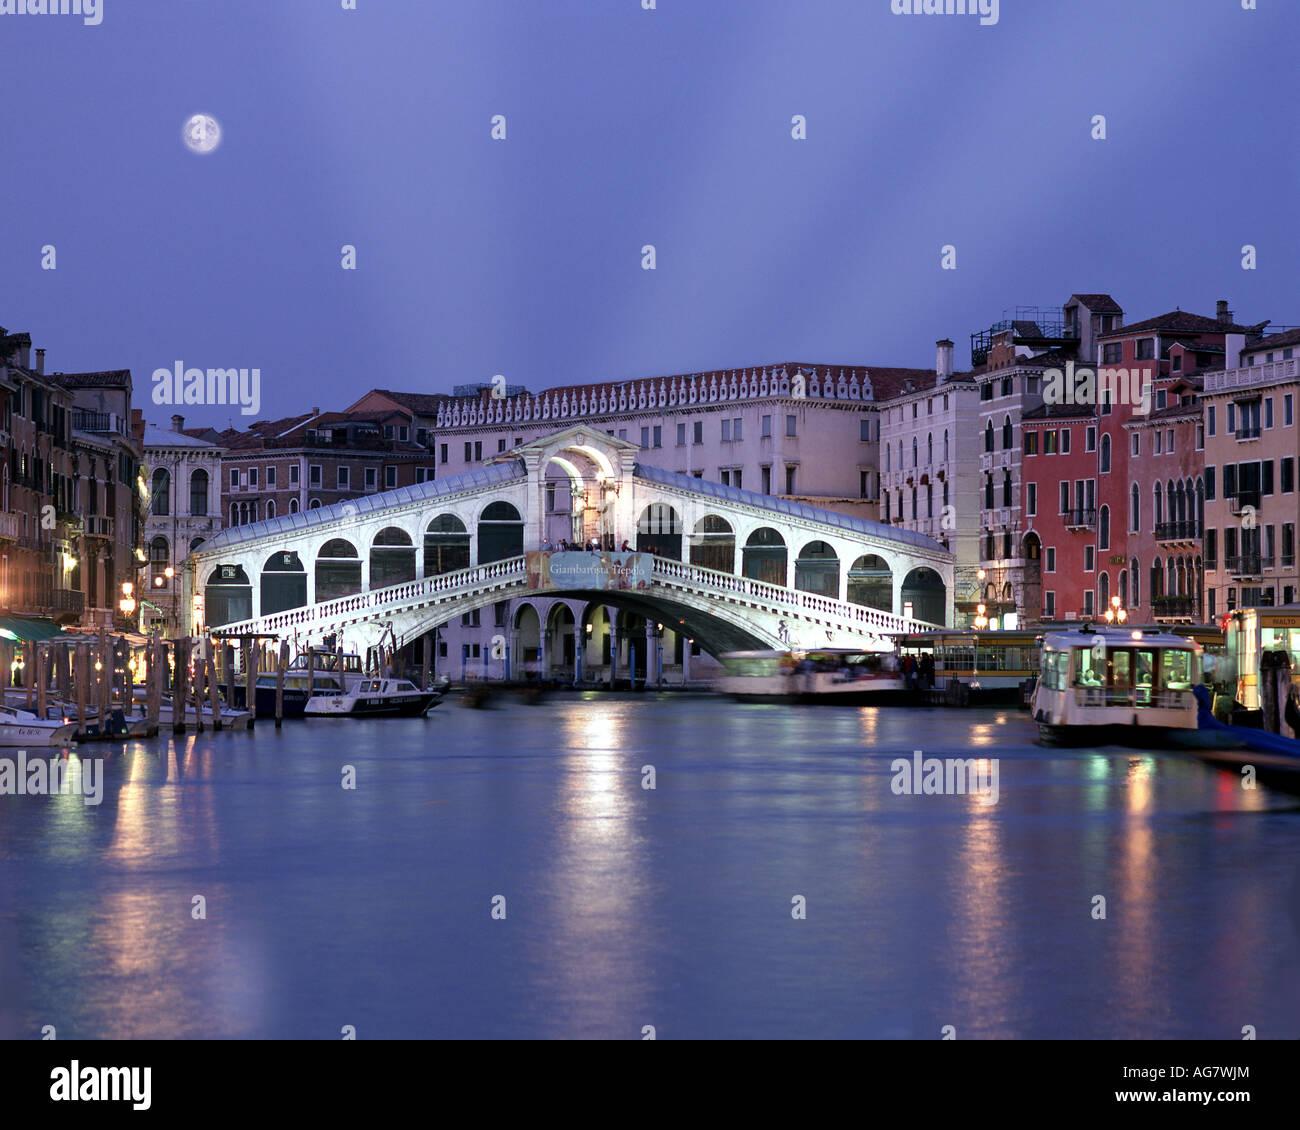 IT - Venedig: Rialto-Brücke bei Nacht Stockbild